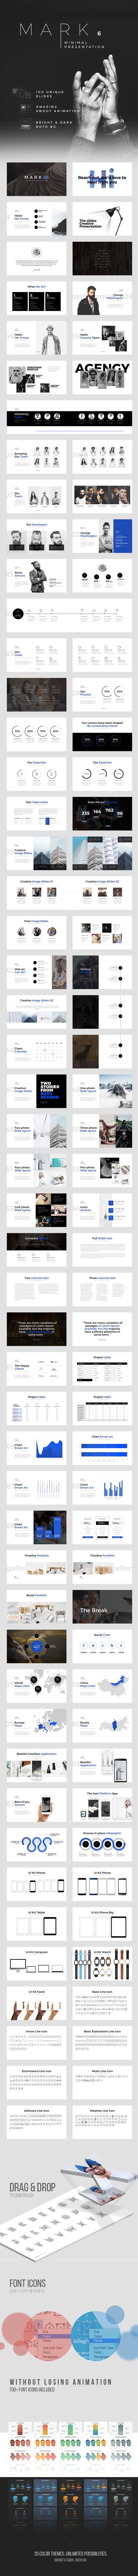 MARK06-Minimal Powerpoint Template. Download here: https://graphicriver.net/item/mark06minimal-powerpoint-template/17168654?ref=ksioks